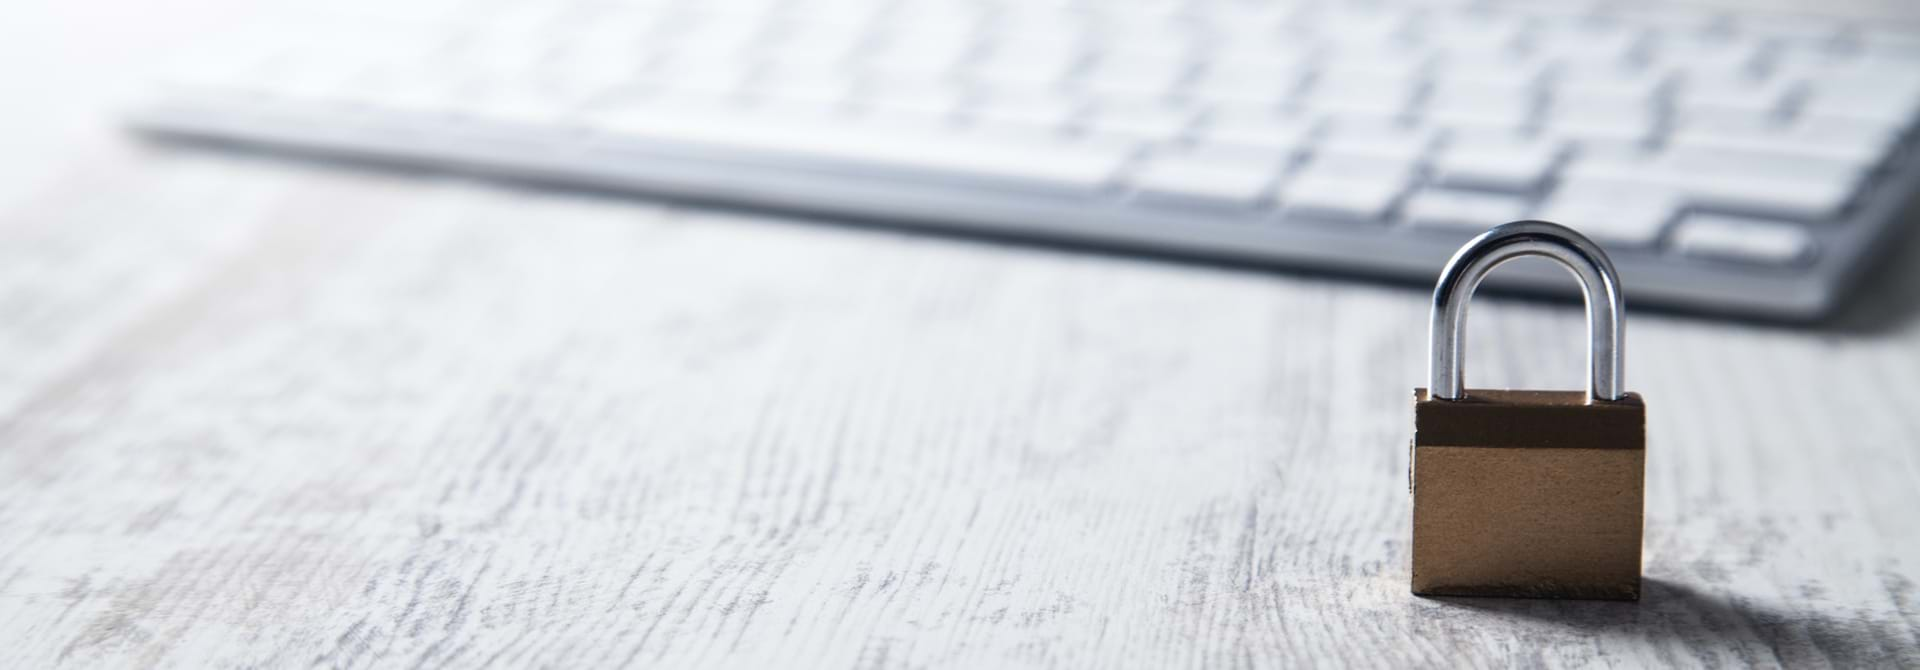 GDPR Databeskyttelse Web